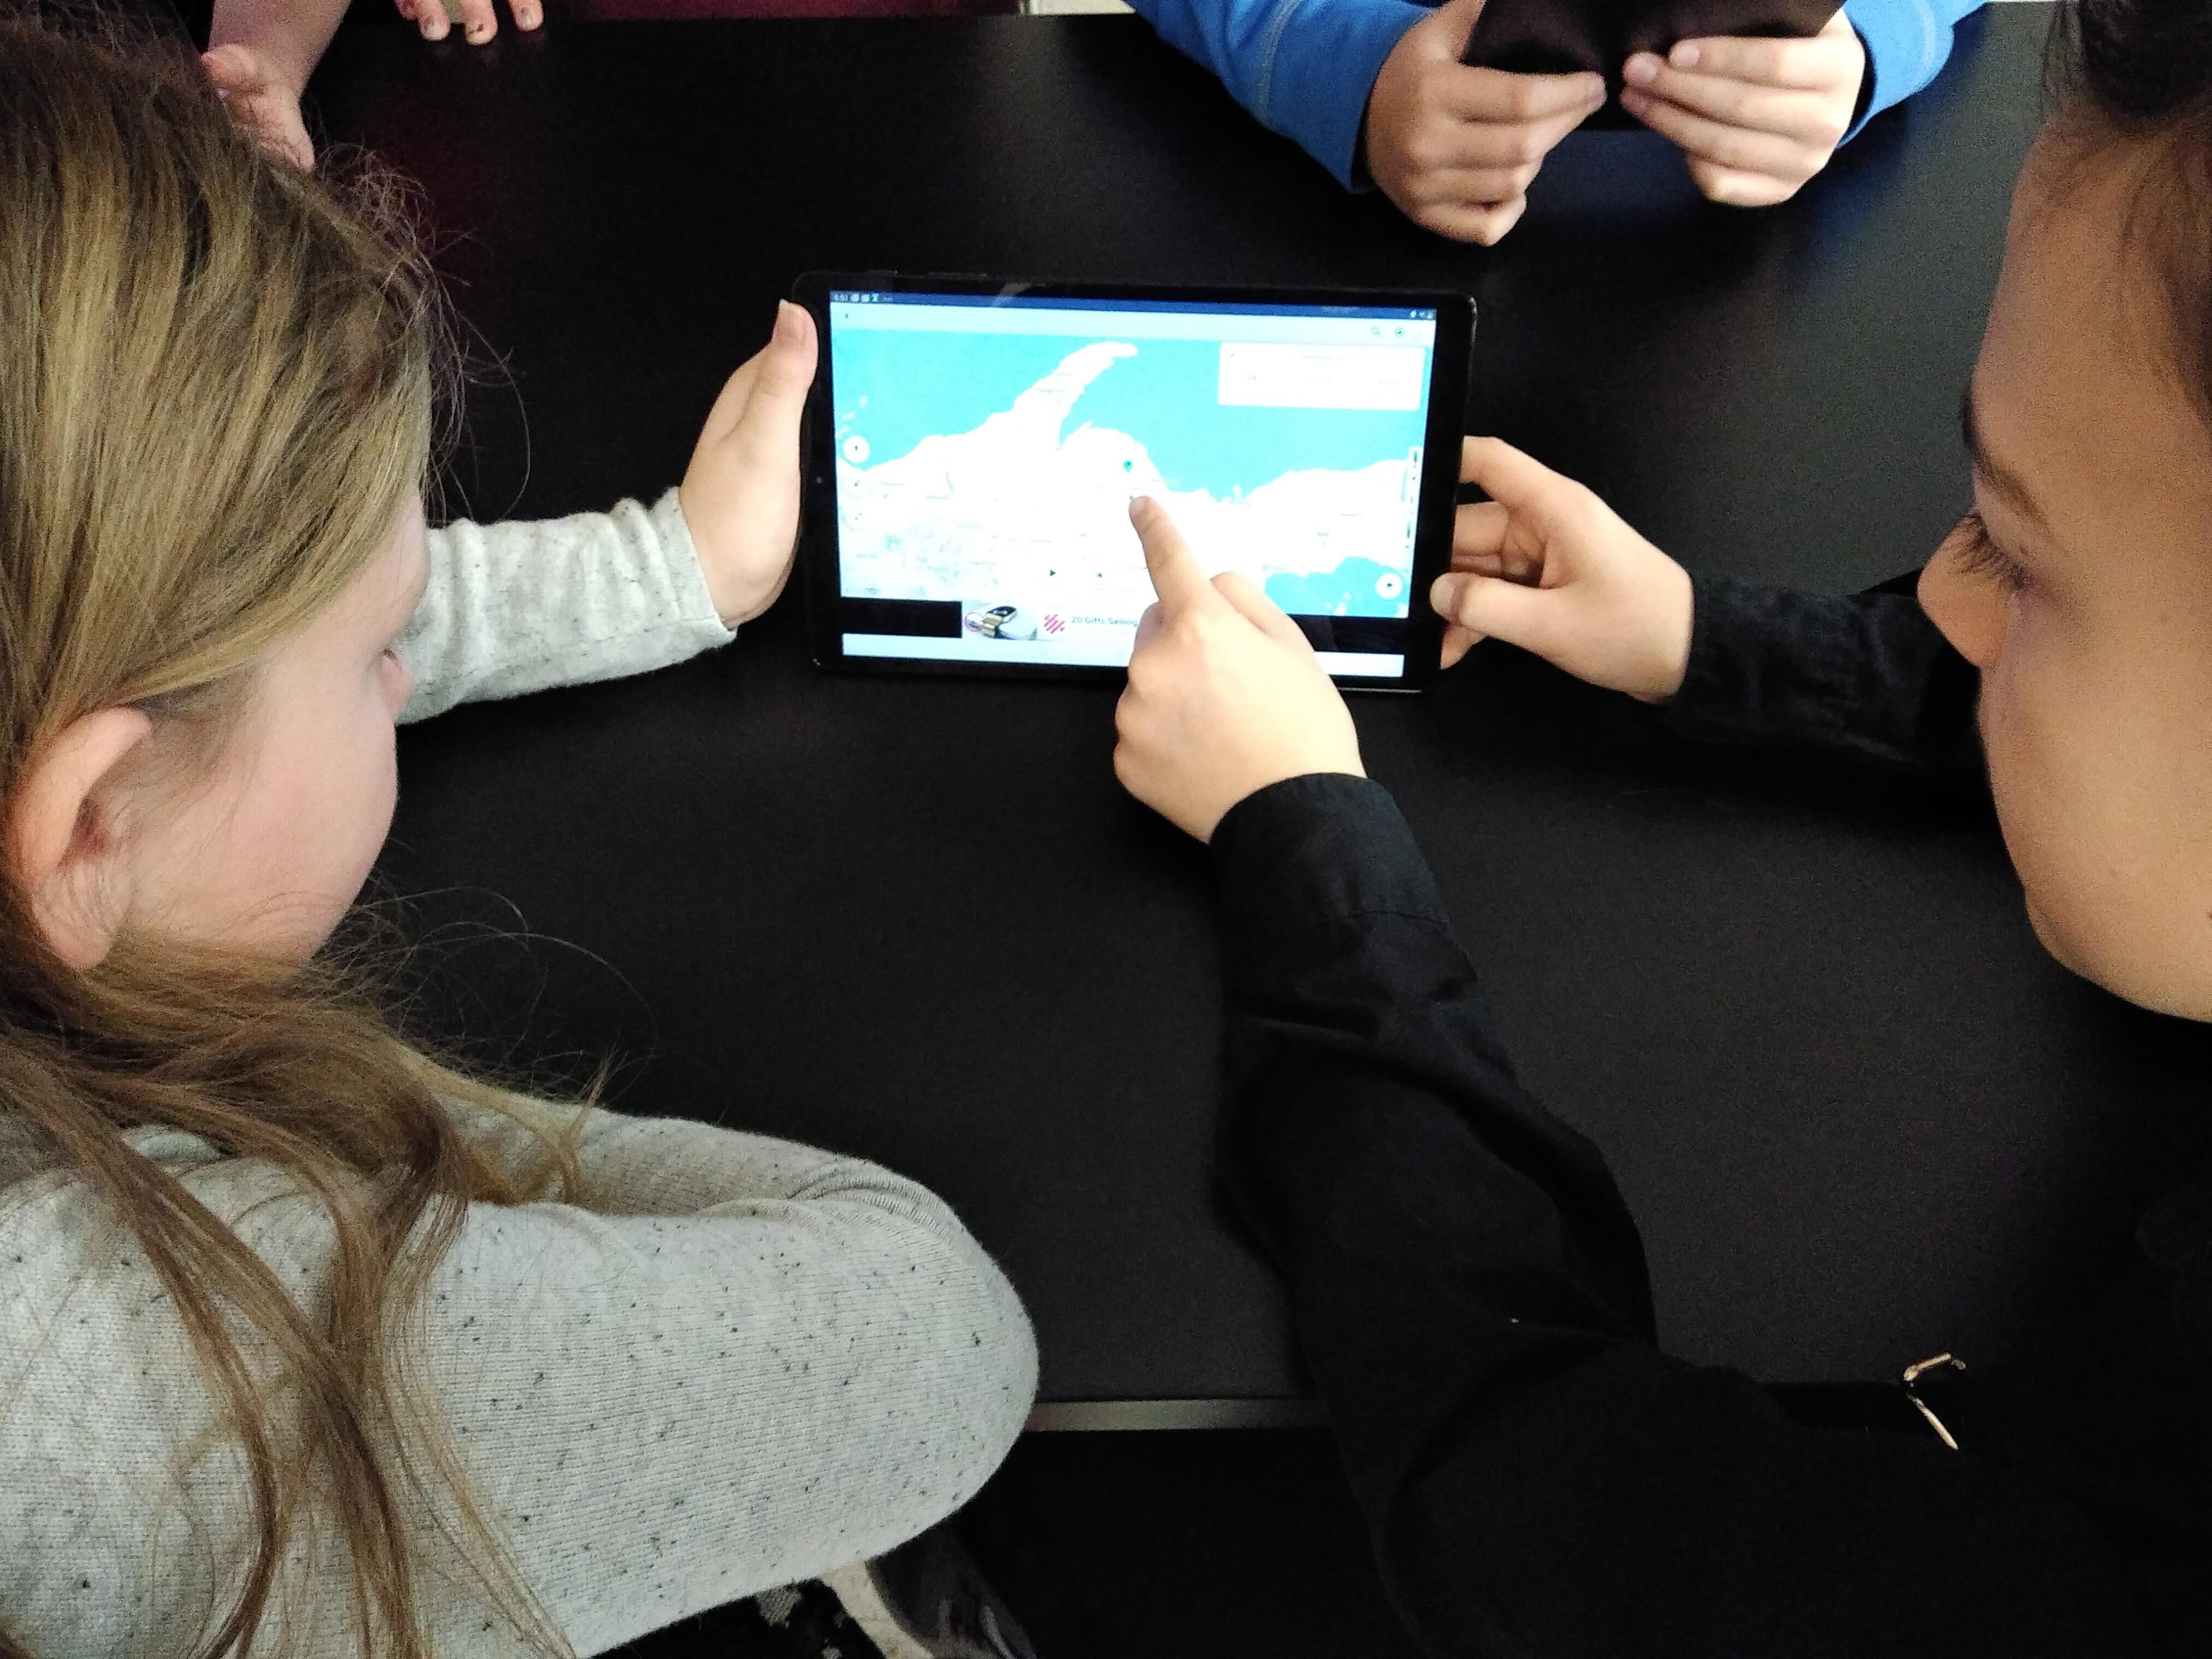 Students using Samsung Galaxy Tablets